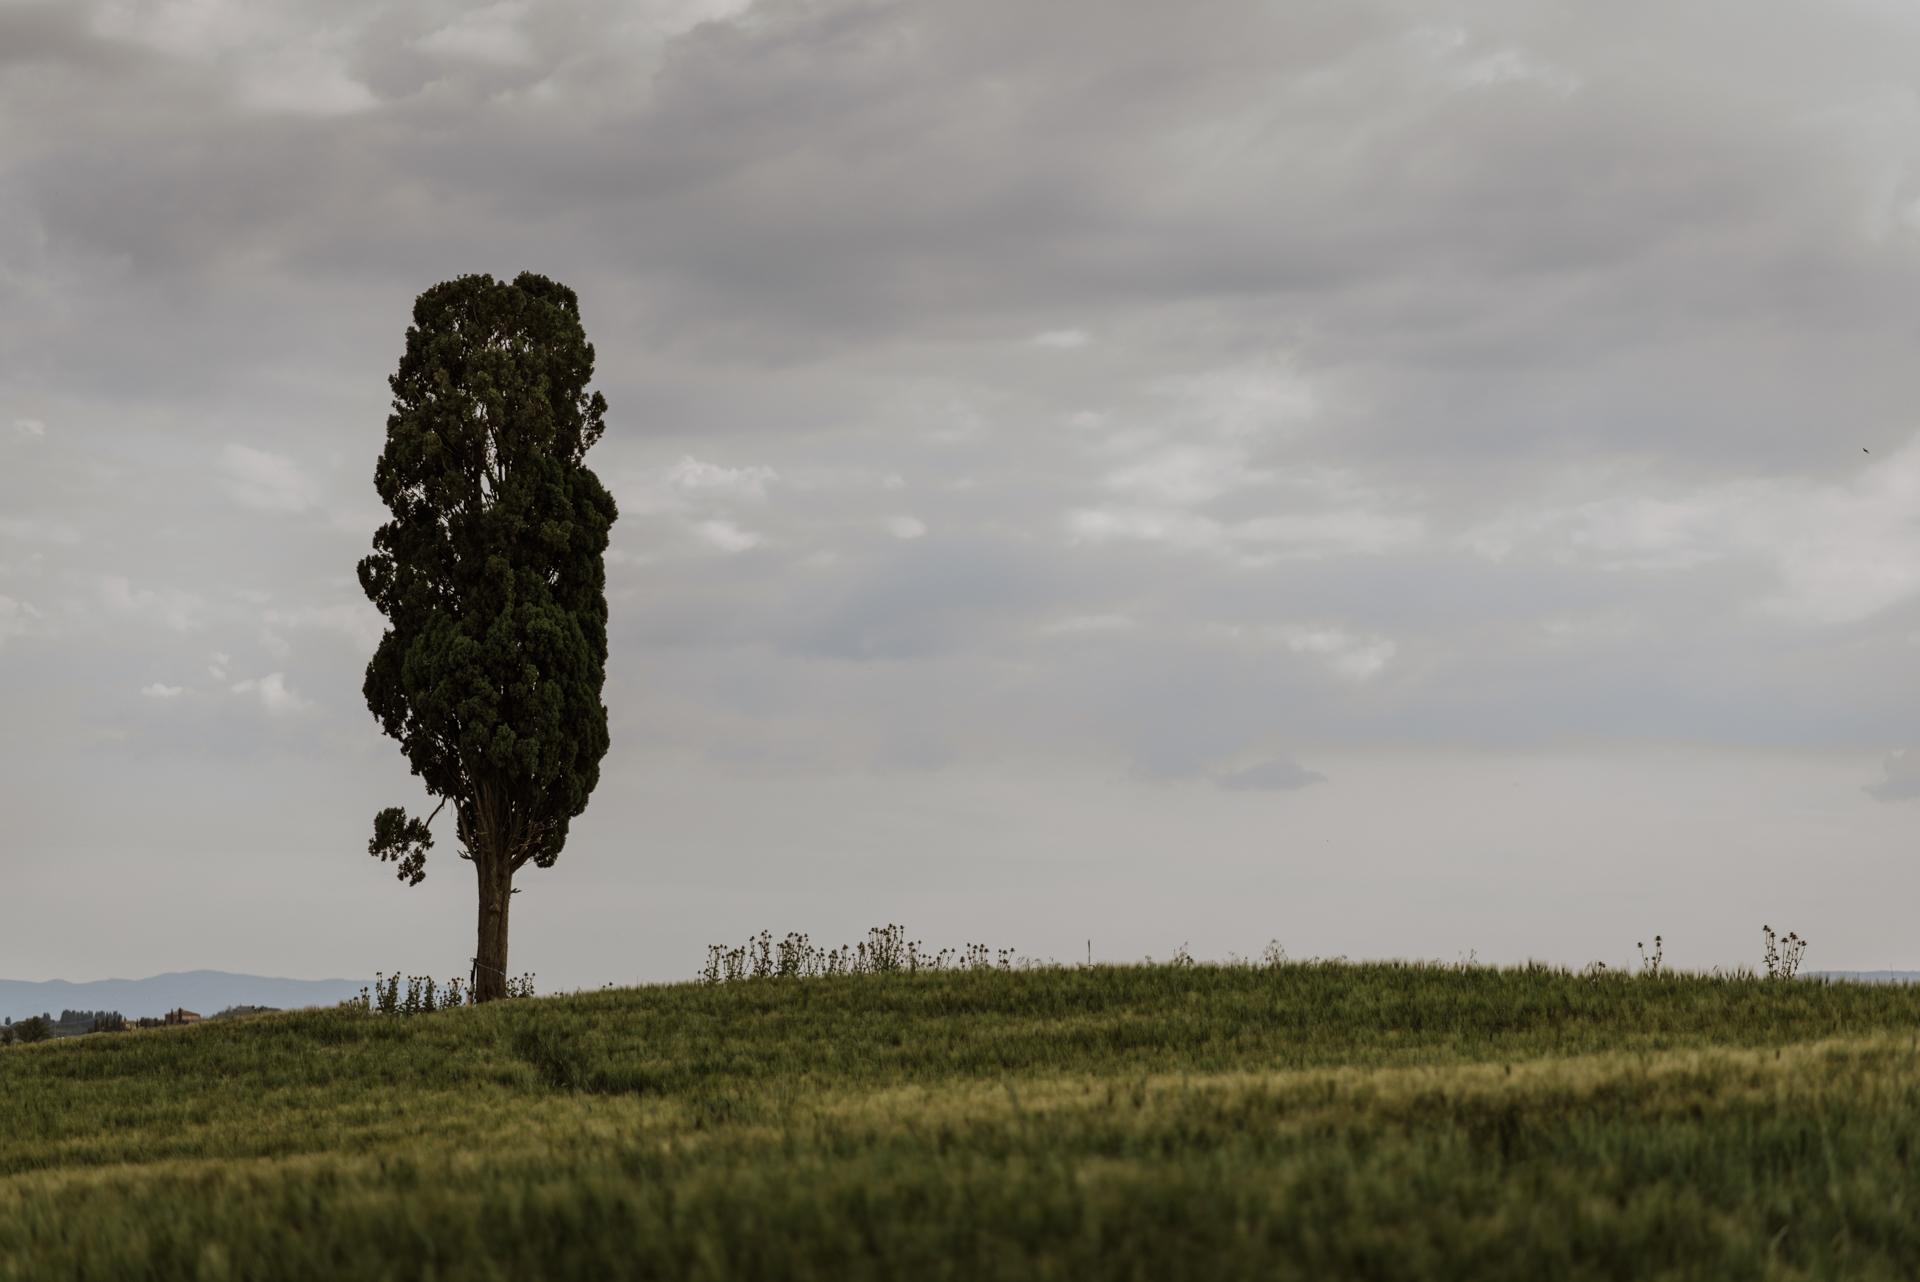 Fotografo a Siena Marco Vegni